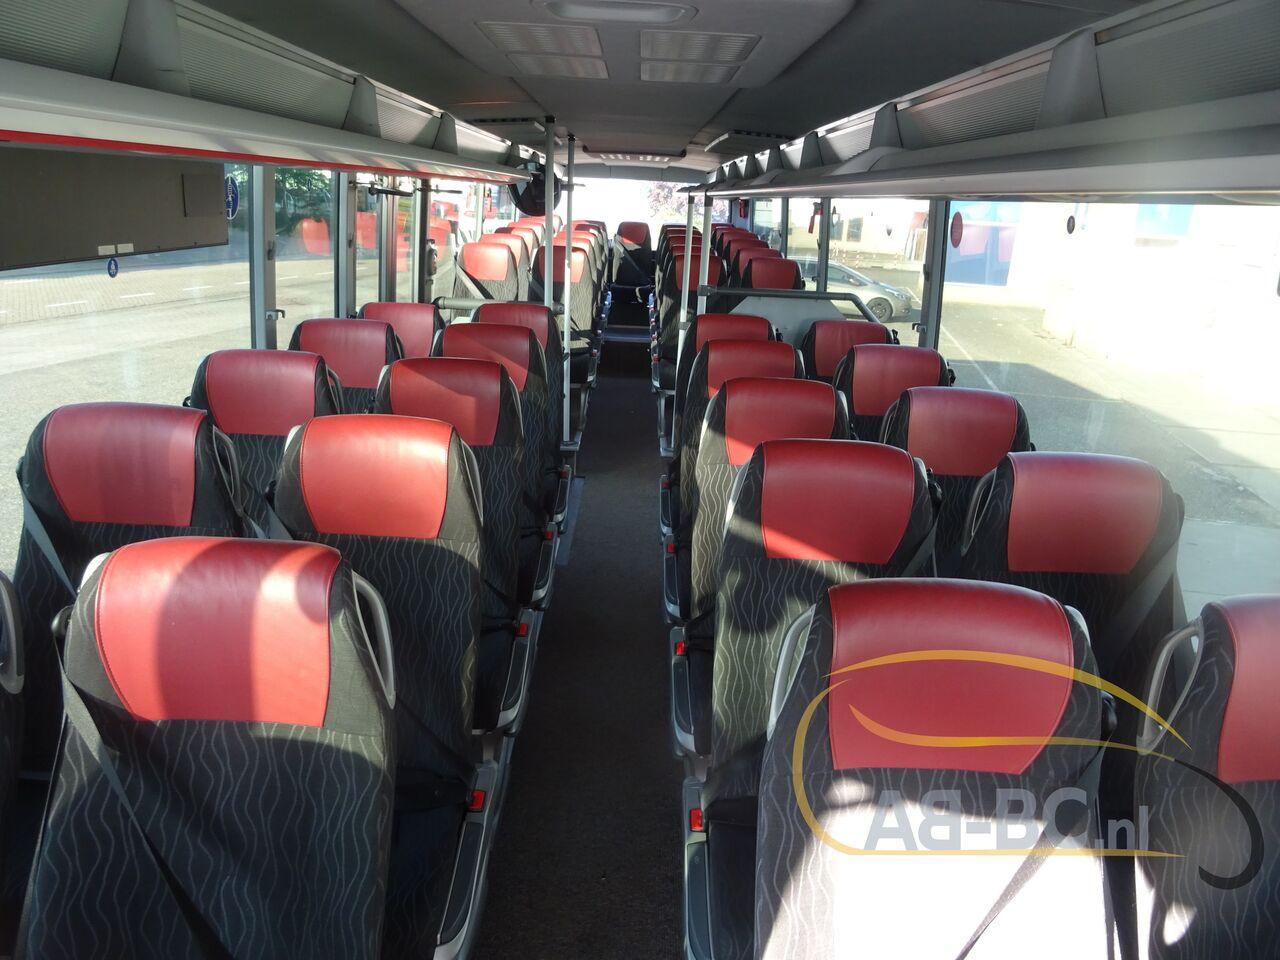 coach-bus-SETRA-S415H-52-Seats-EURO-6-Liftbus---1630913400728594733_big_b669ae85725675ba53ffd01a72d20b61--21070517141280735500